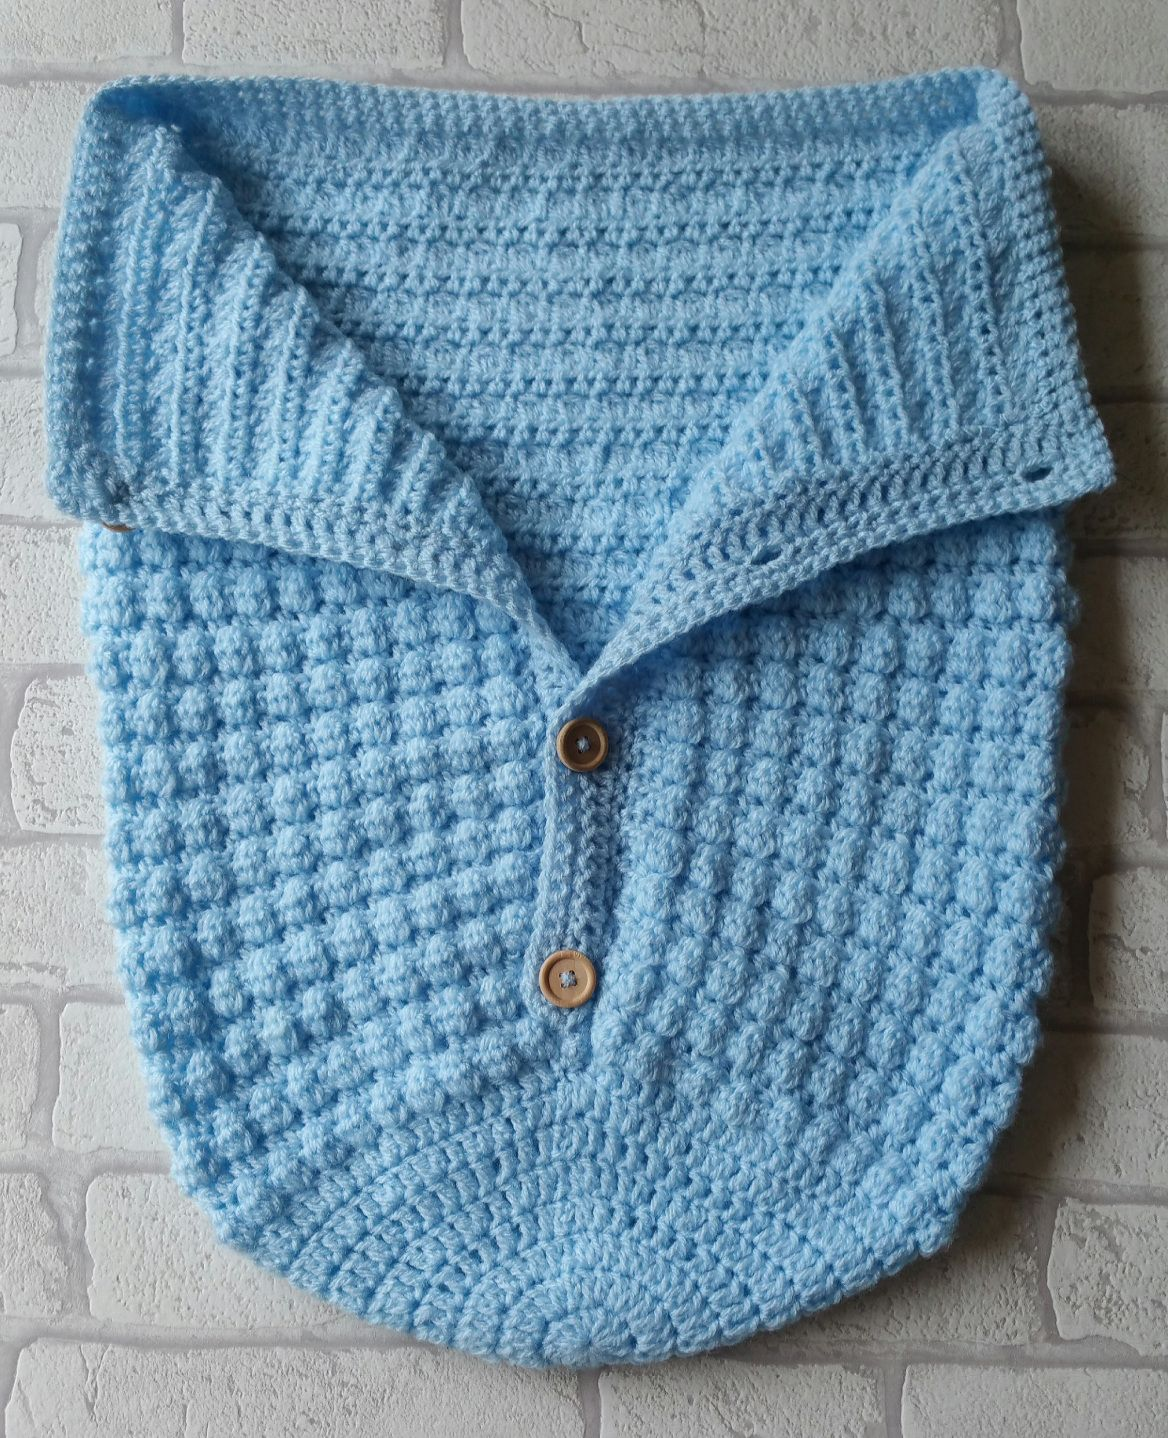 9f2f78160d31 Baby Boy Crochet Sleeping Bag Cocoon Pattern